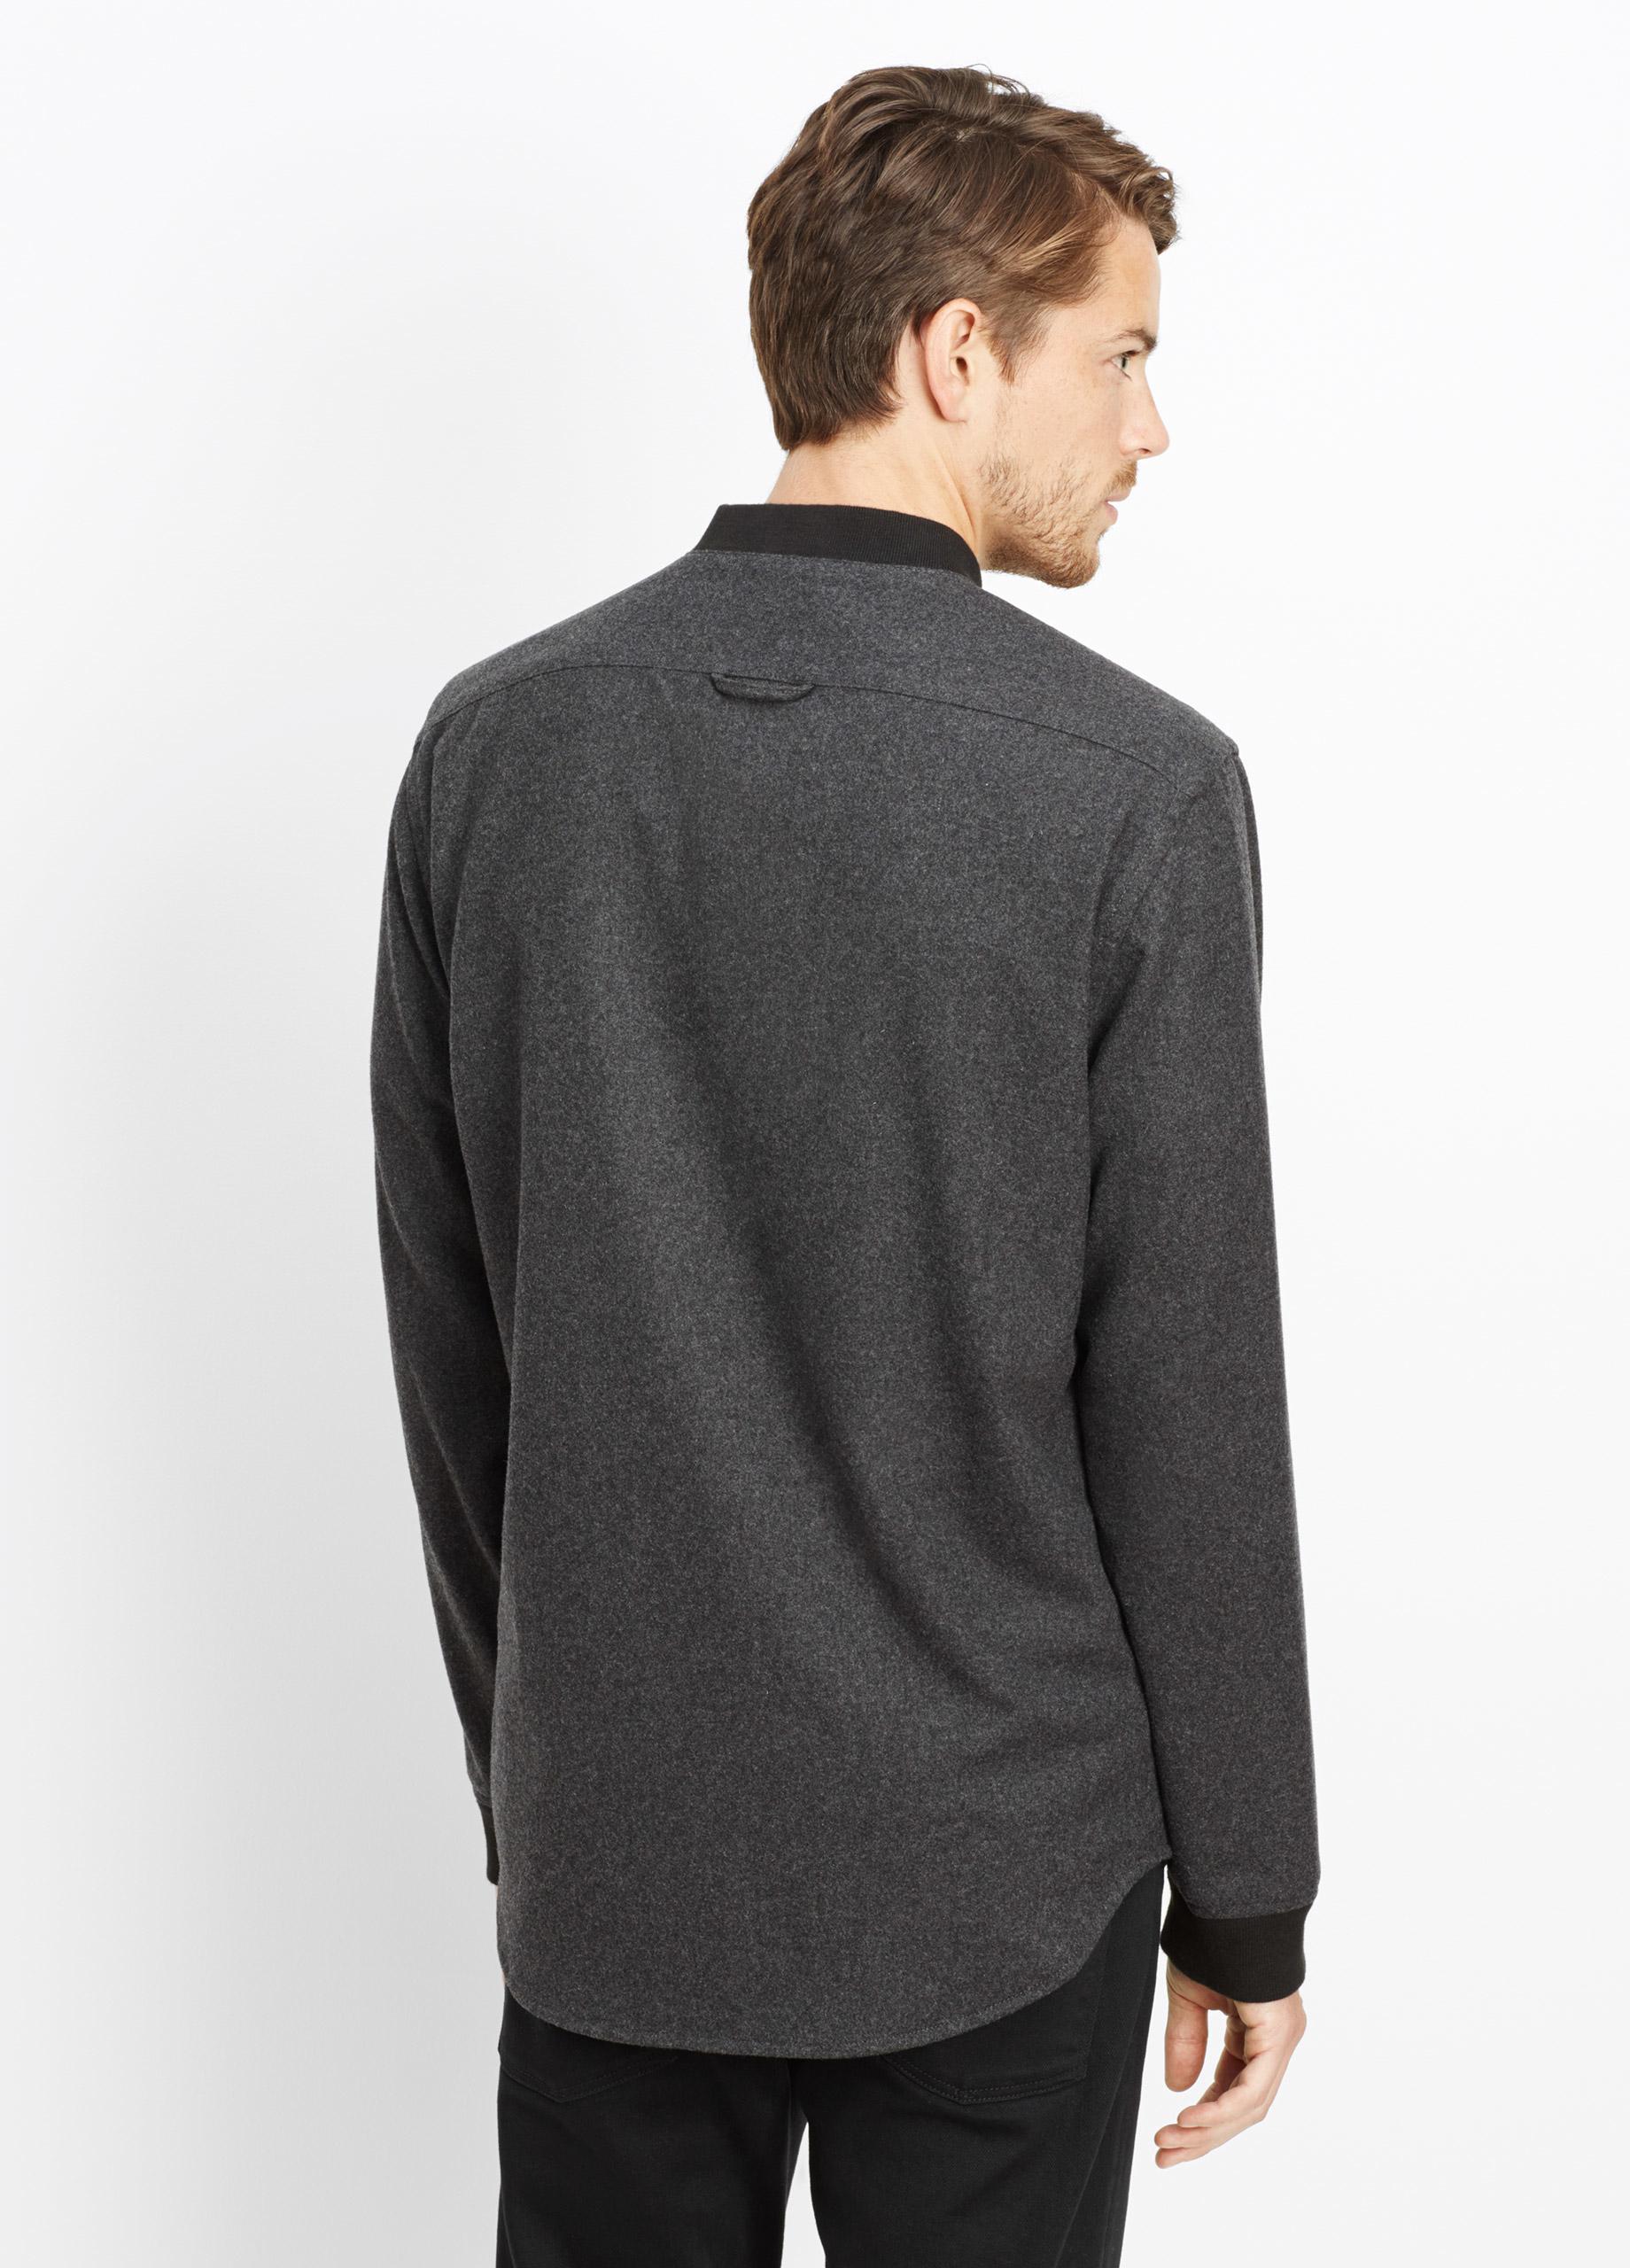 Vince melrose wool flannel shirt jacket in gray for men lyst for Mens wool flannel shirt